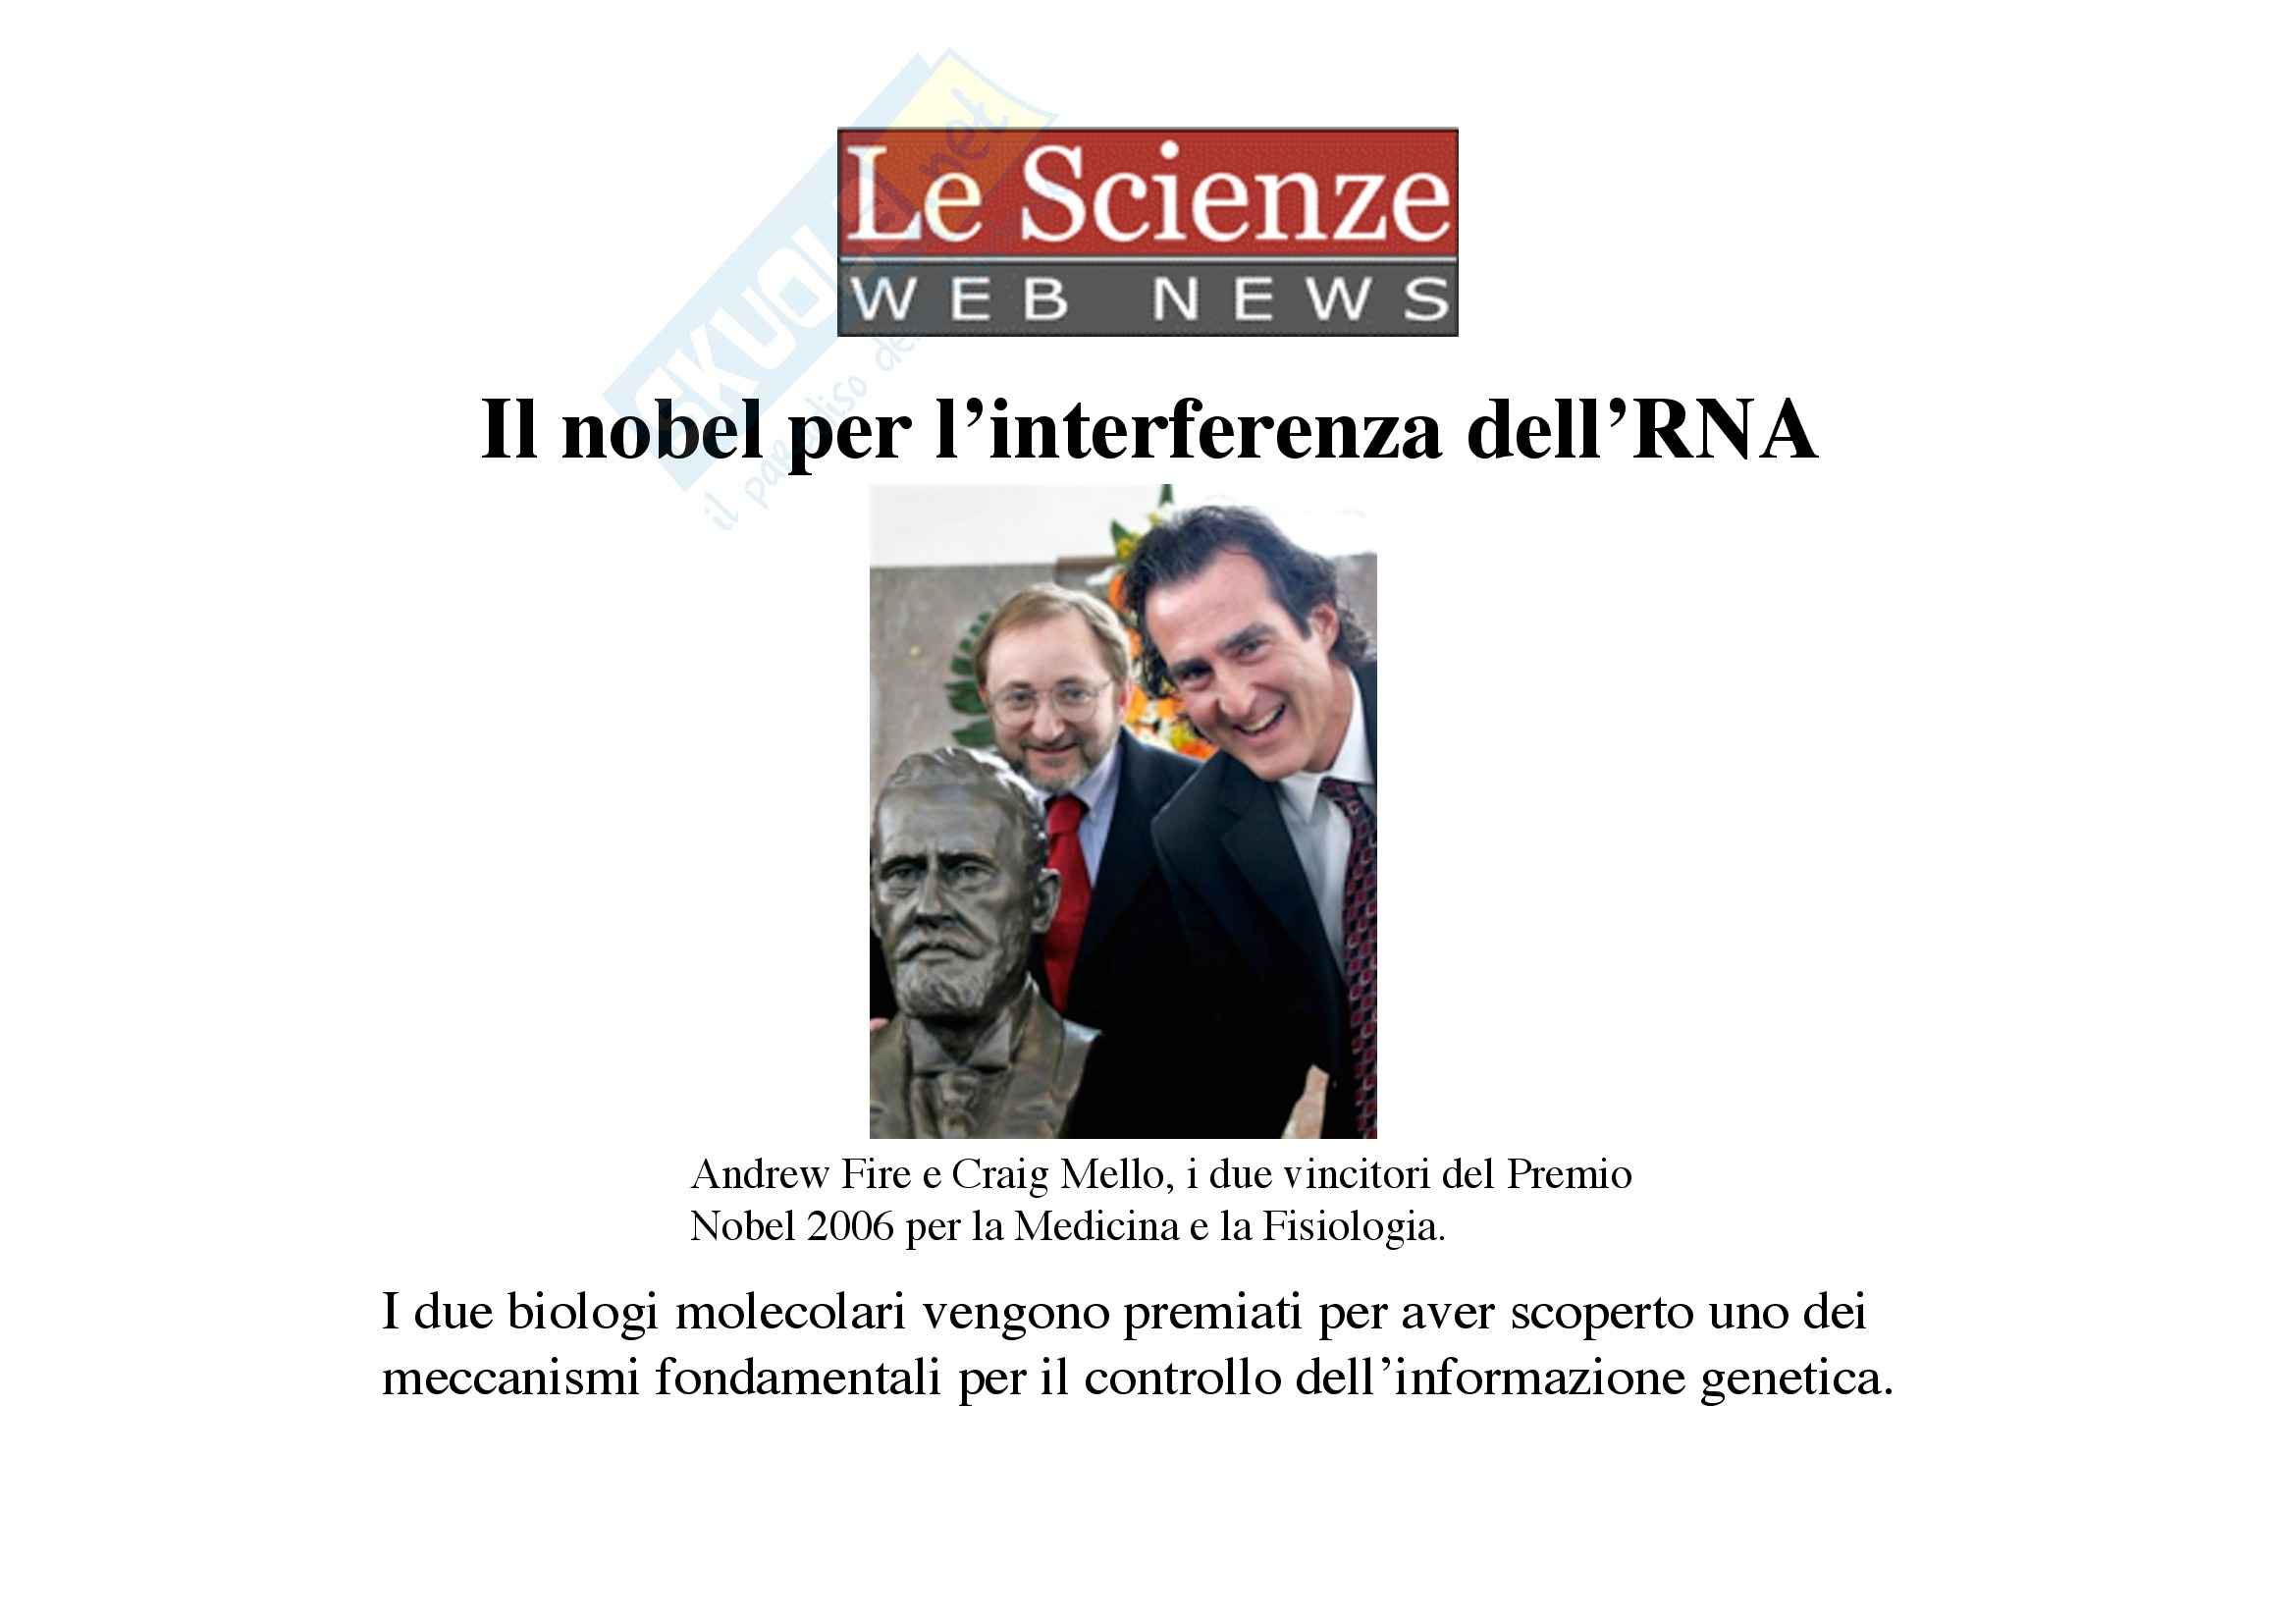 Genetica umana - ncRNA - Appunti